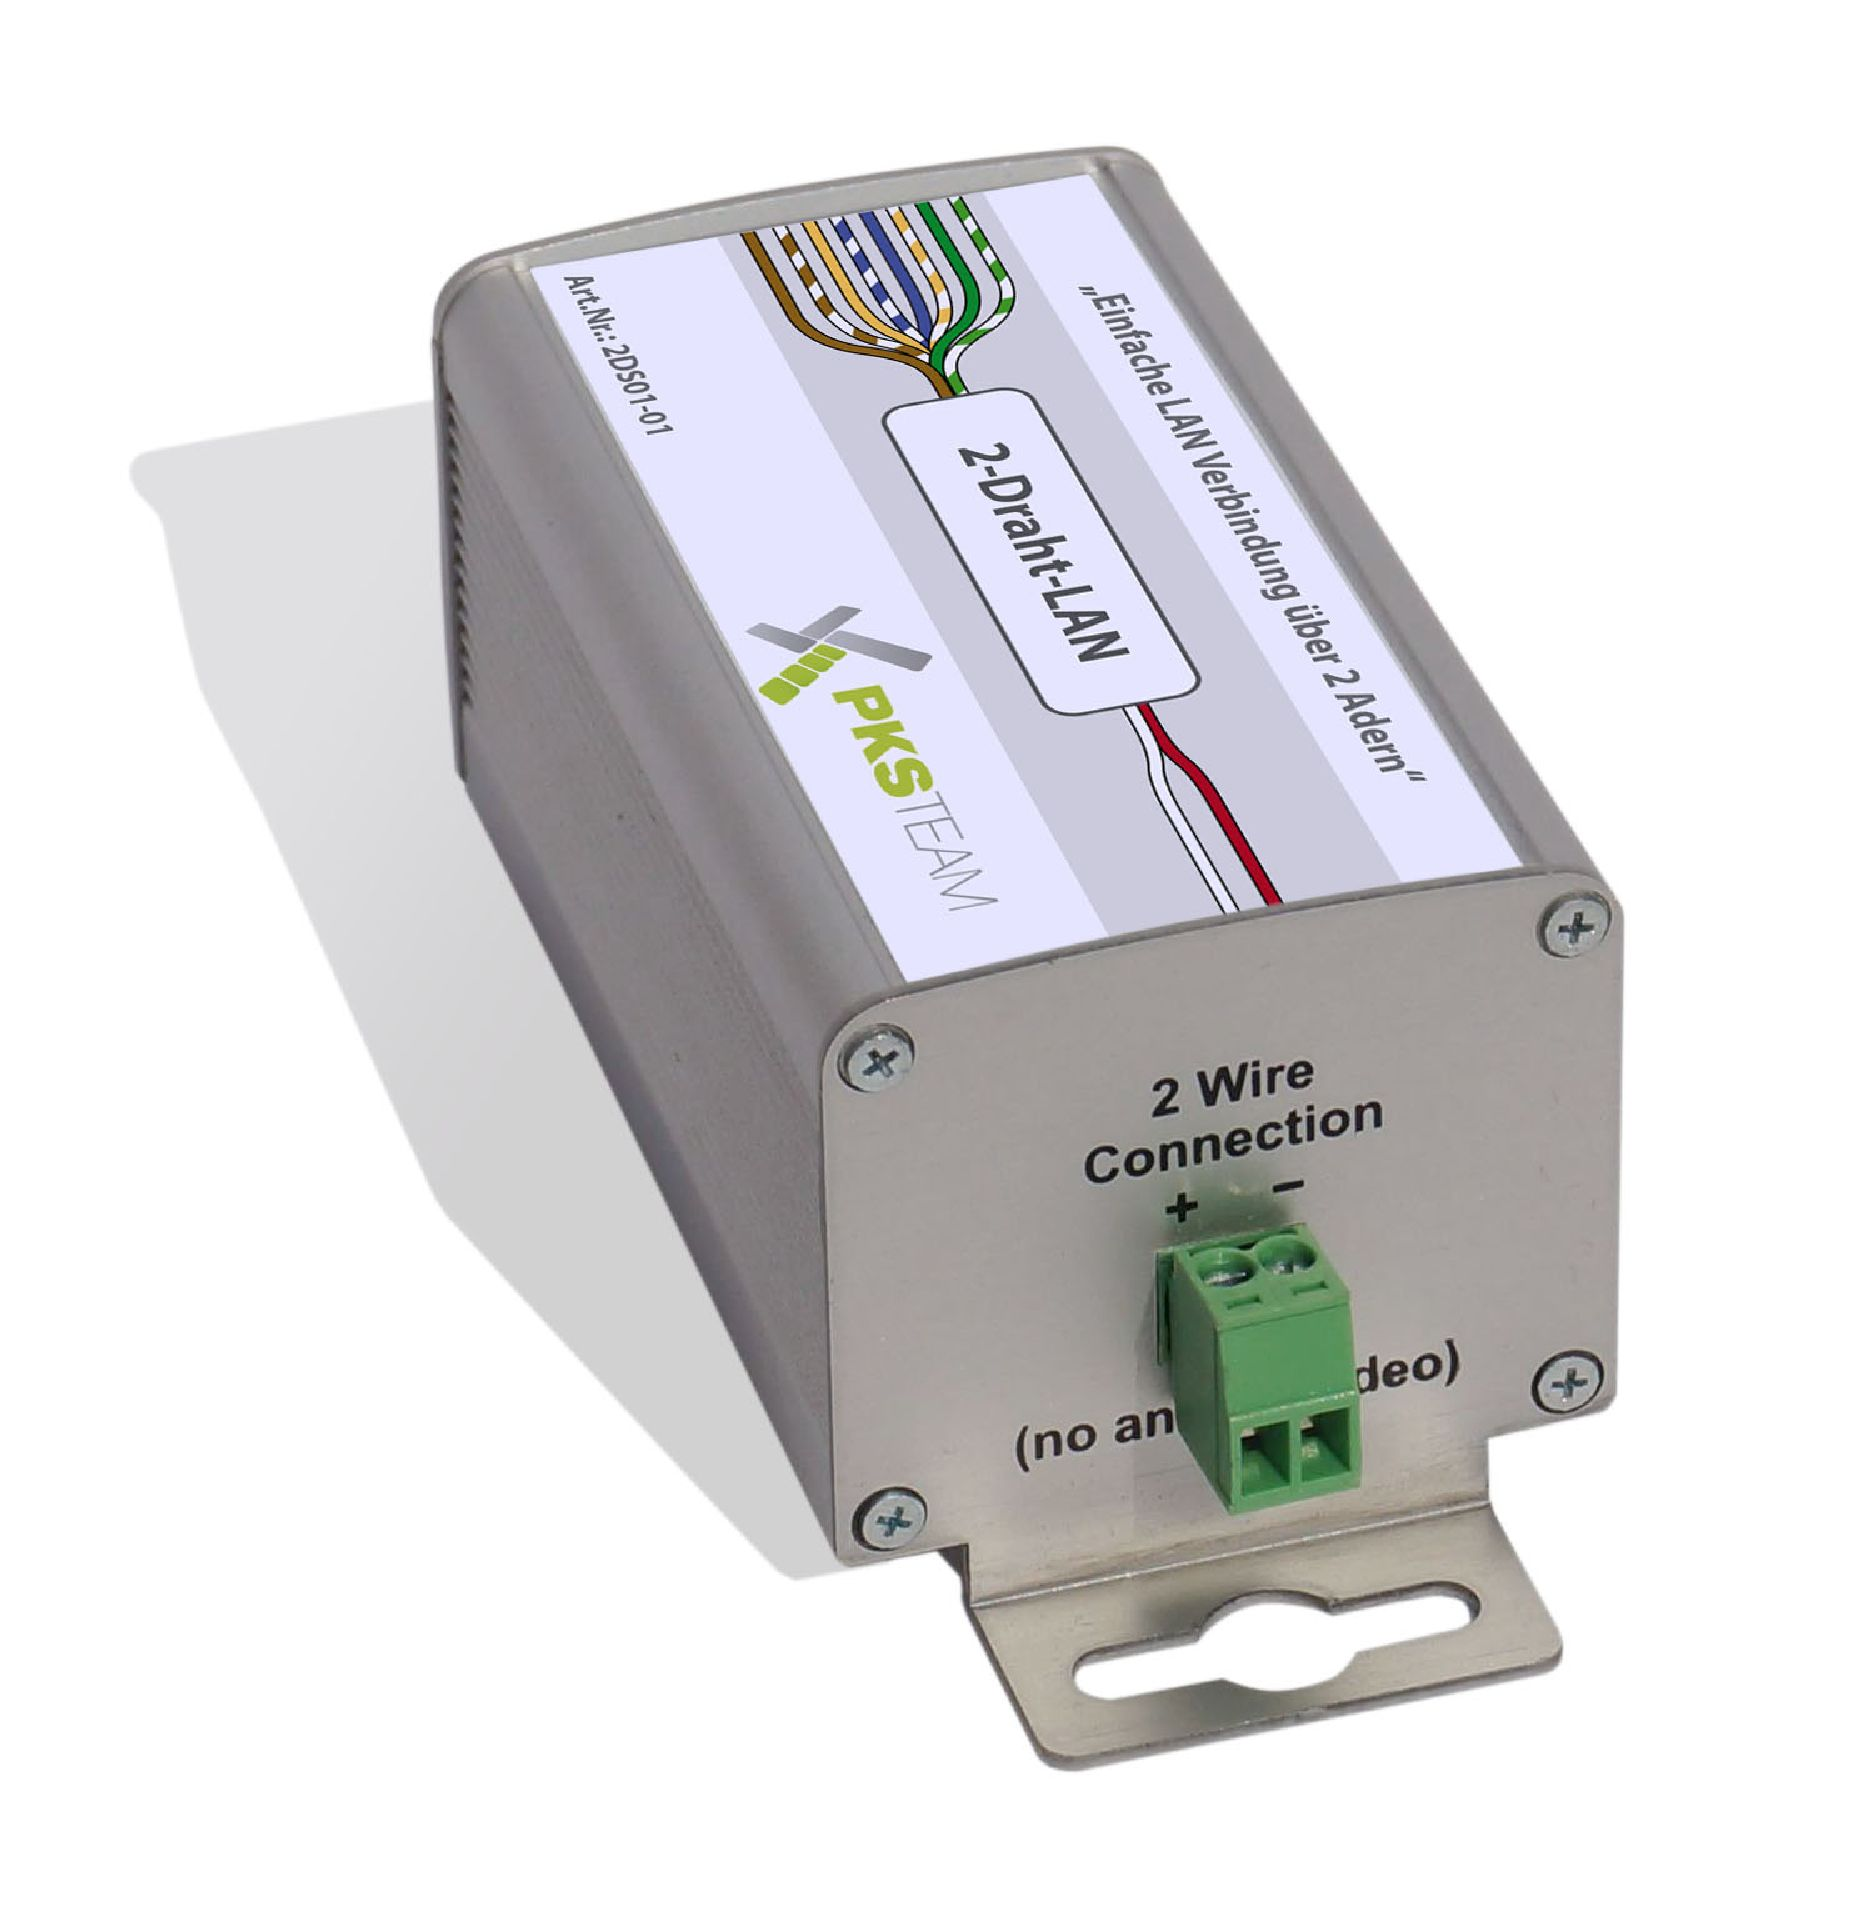 2-Draht-Netzwerk-Adapter mit PoE